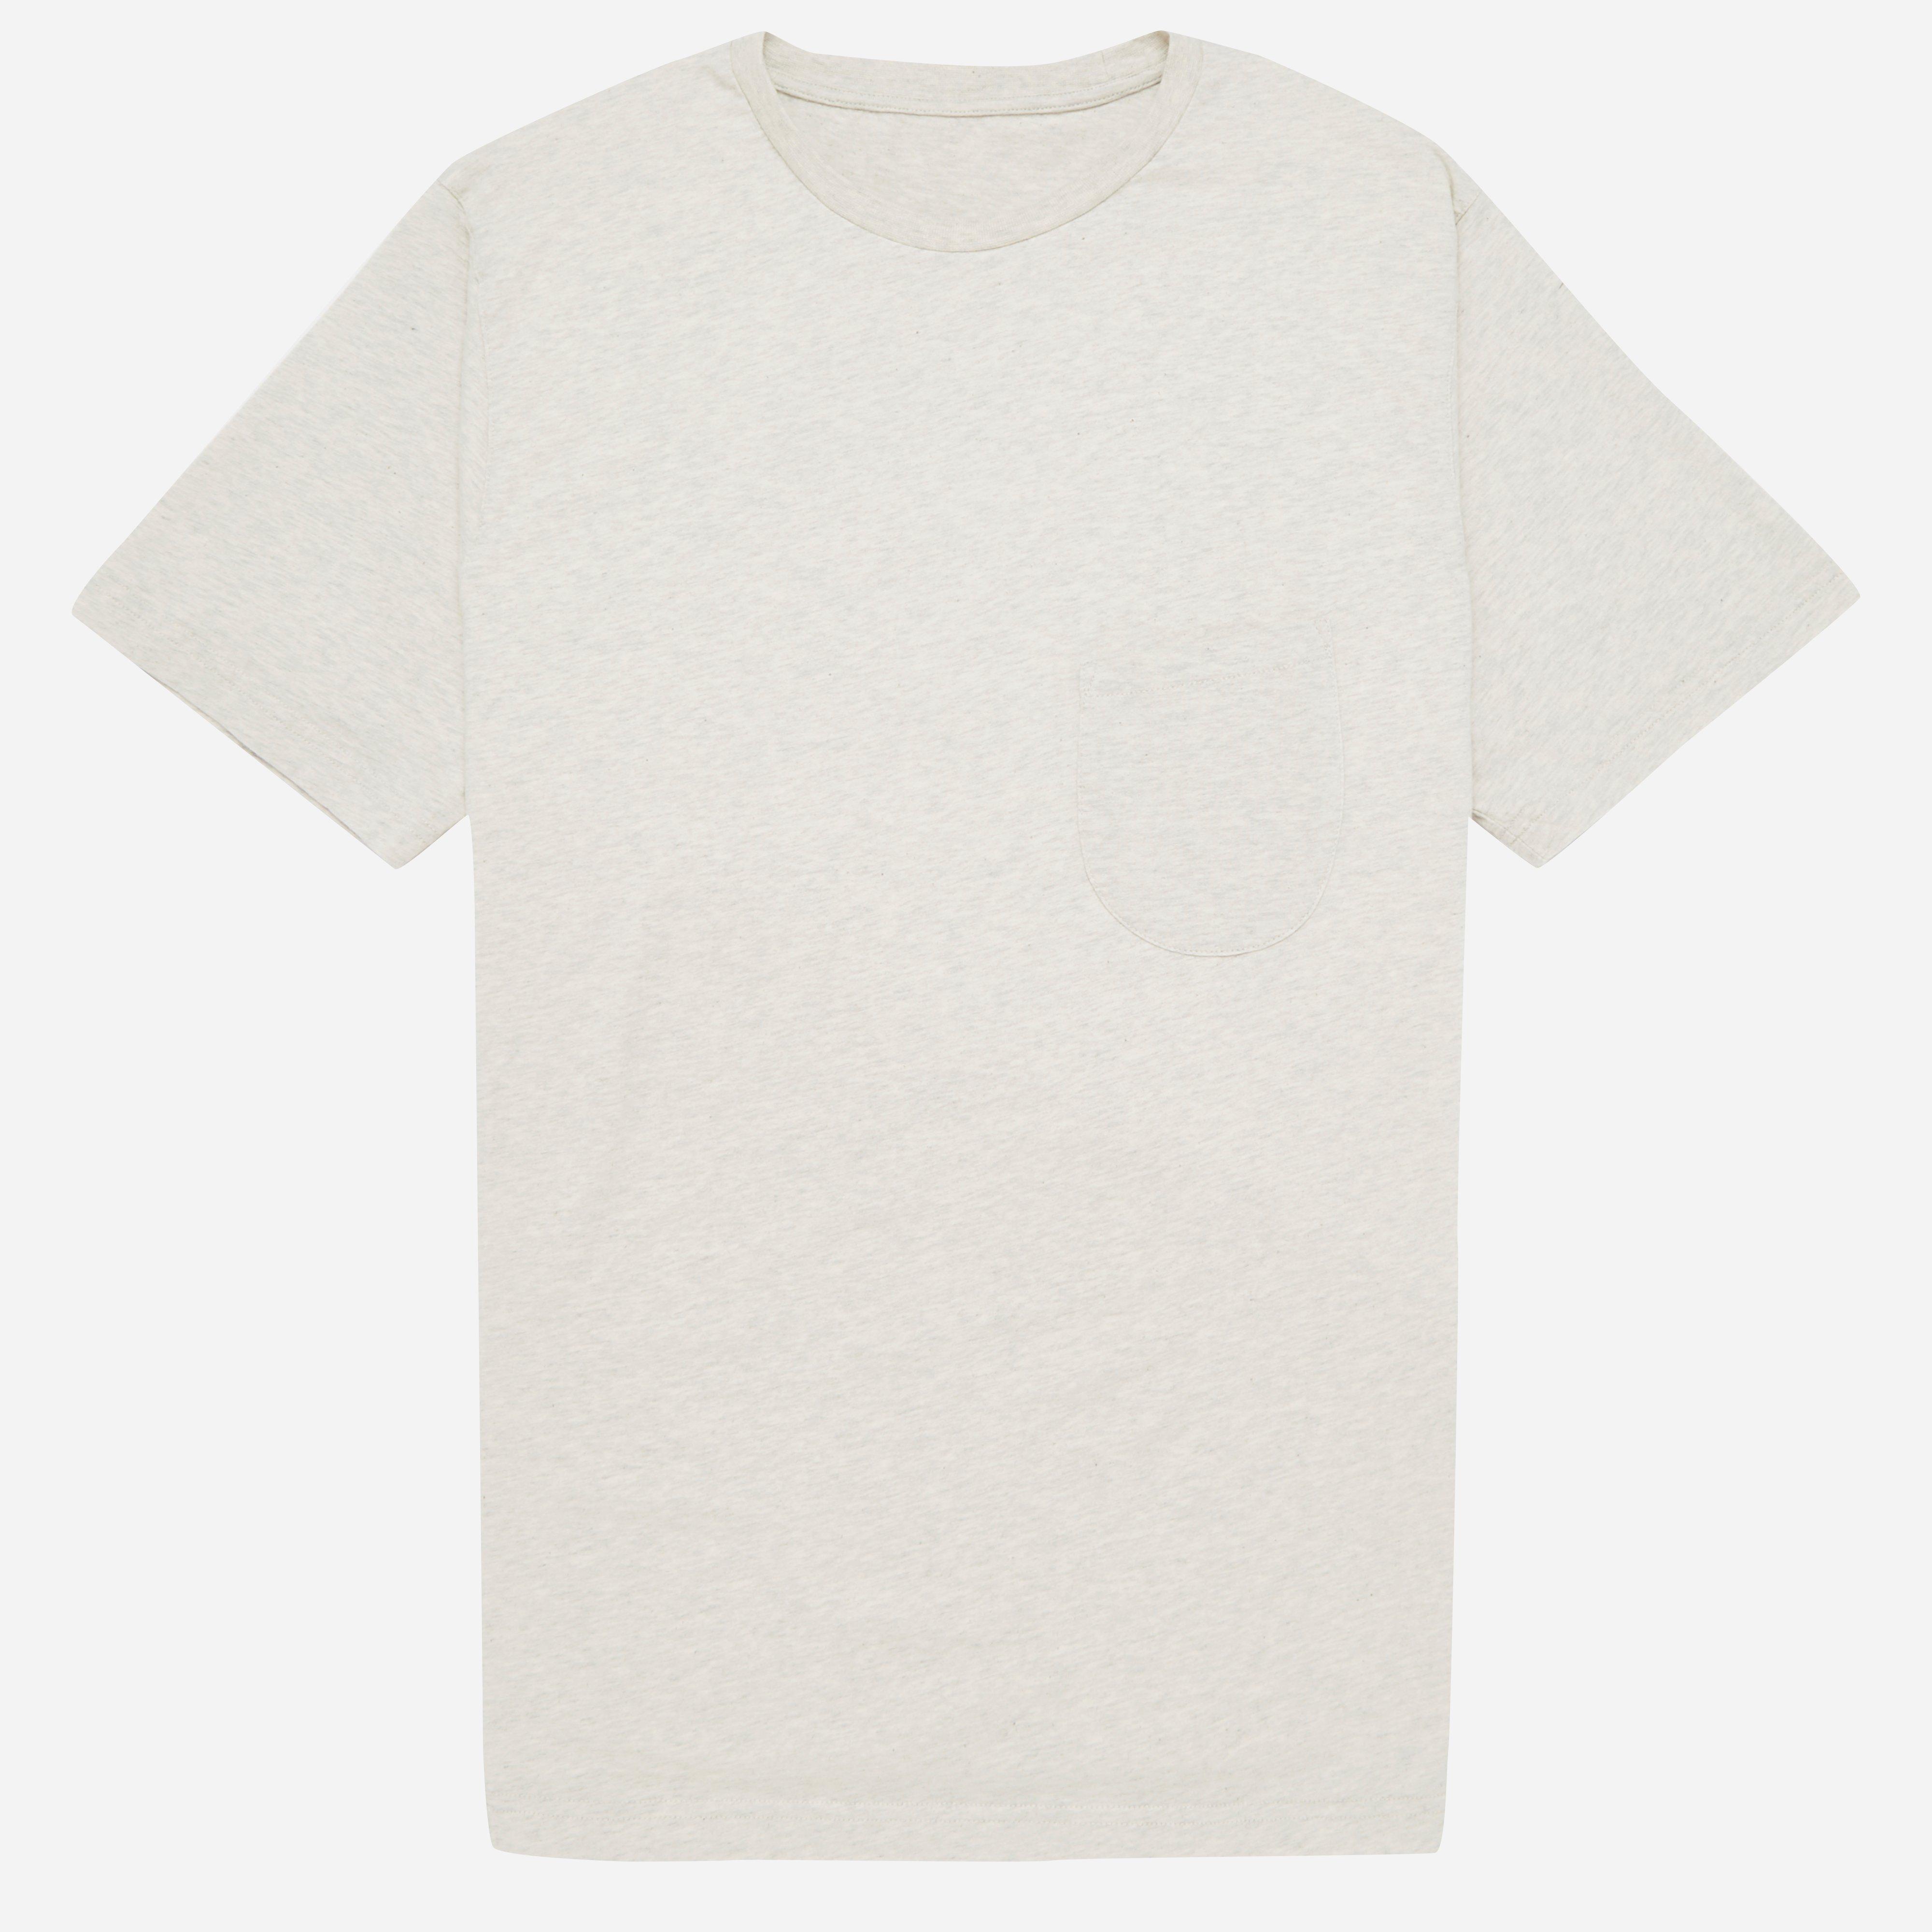 Universal Works Jersey Pocket T-shirt